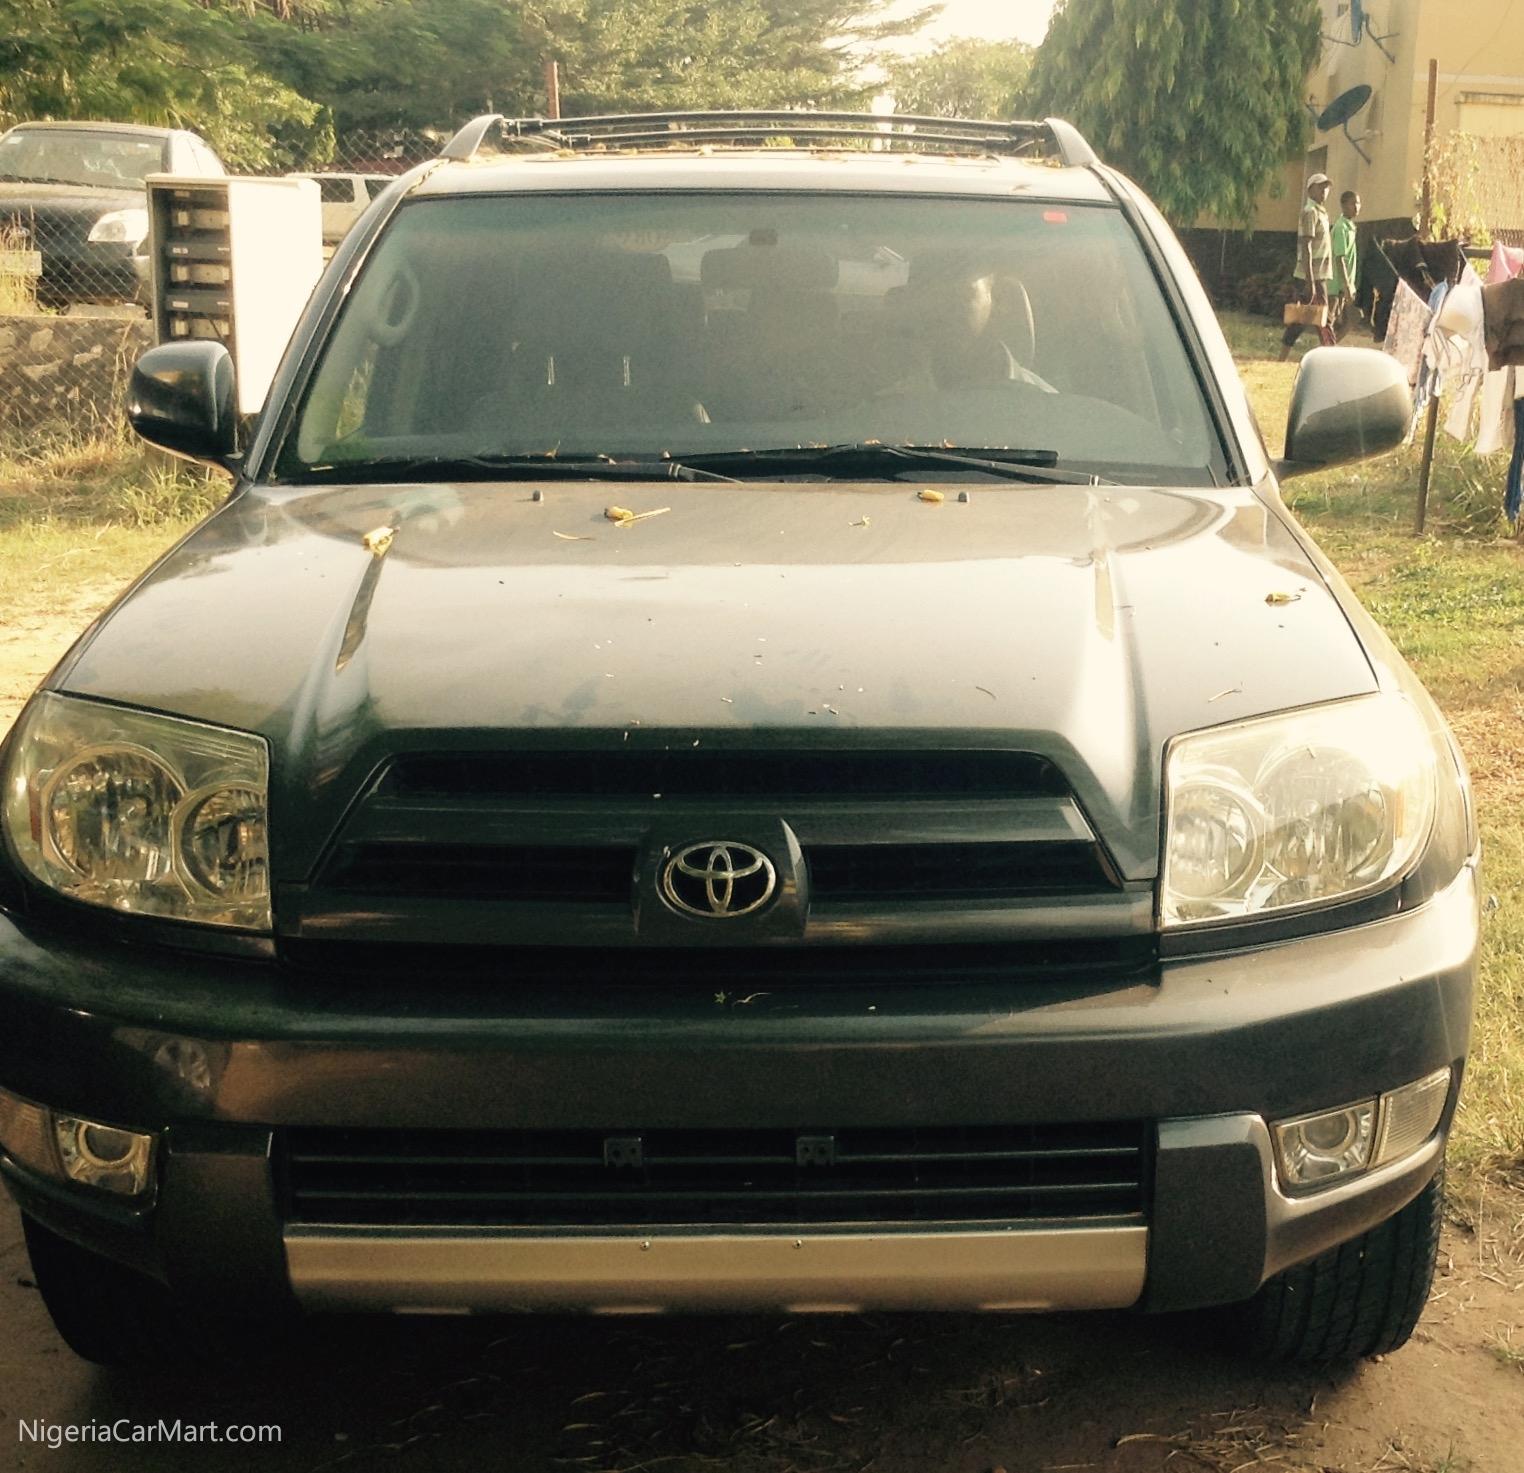 Used Toyota 4 Runner: 2006 Toyota Fortuner 4Runner Used Car For Sale In Abuja